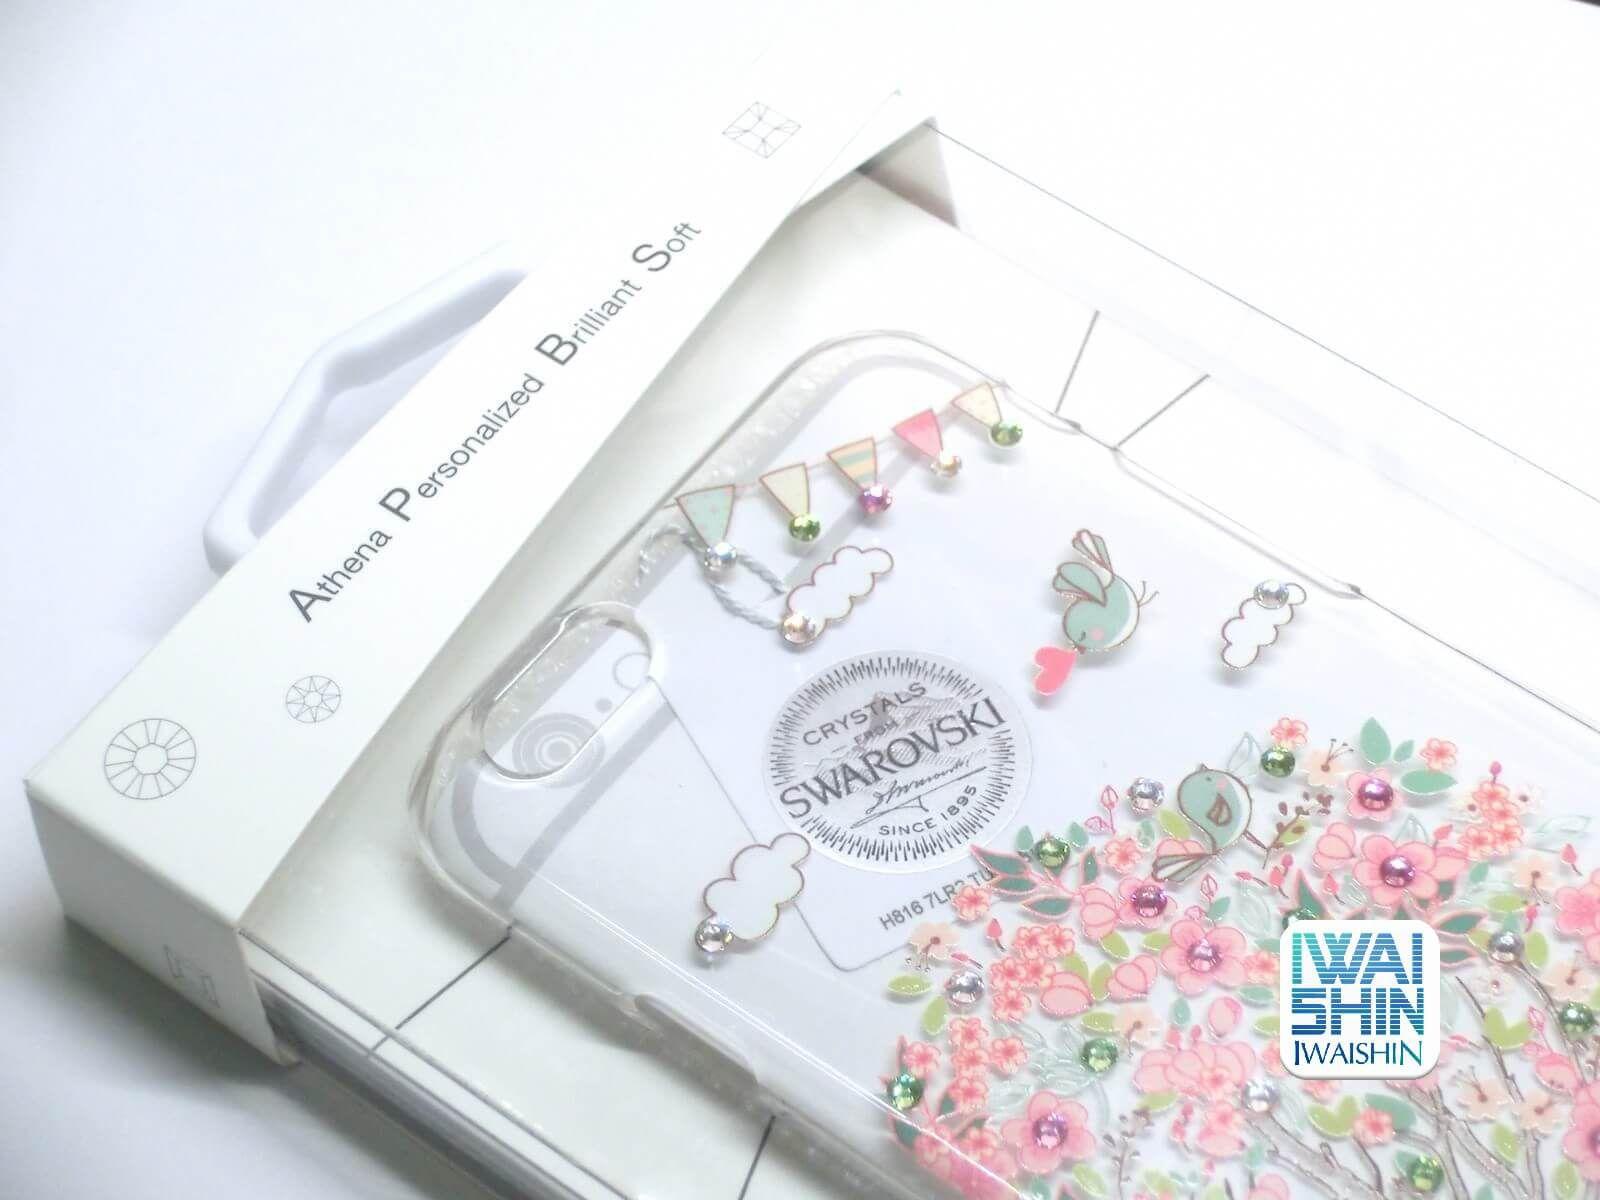 APBS 施華洛世奇 IPhone 6 保護殼5733